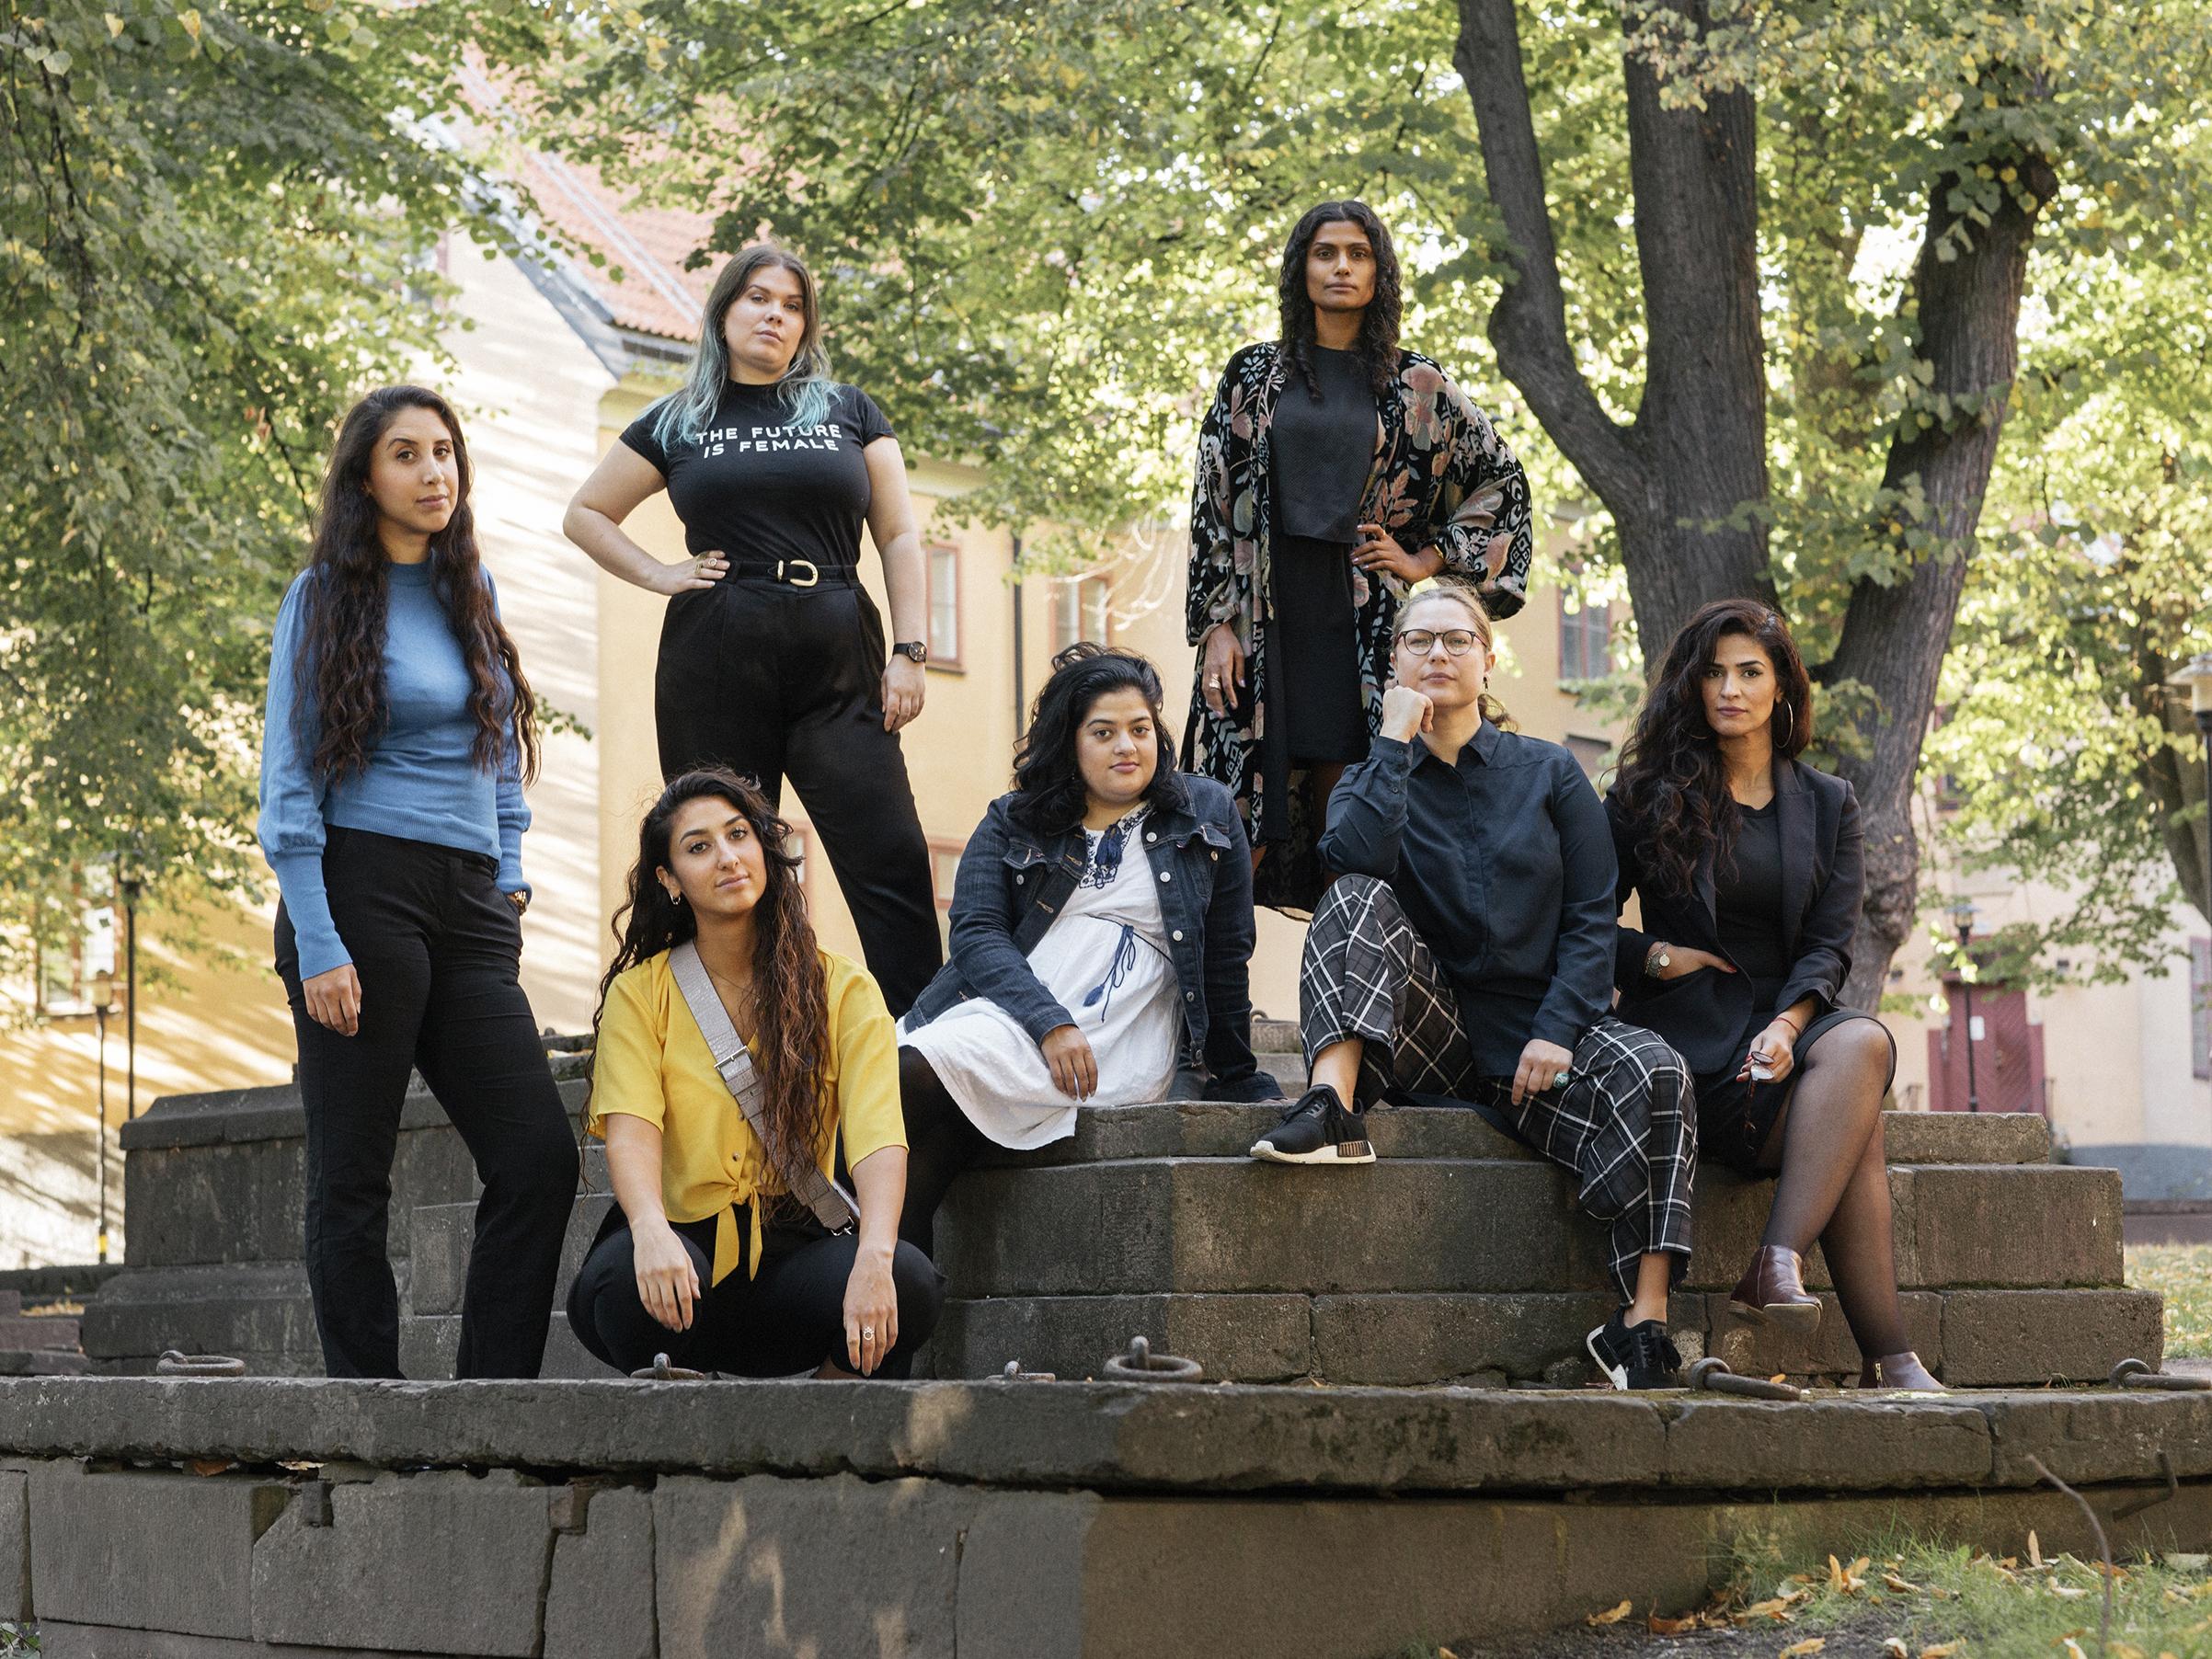 StreetGaris board members, from left to right: Ronak Moaf Mirlashari, Ailin Moaf Mirlashari, Sofia Lindh, Maliha Khan, Manel Rodrick, Emma Strom and Dima Sarsour